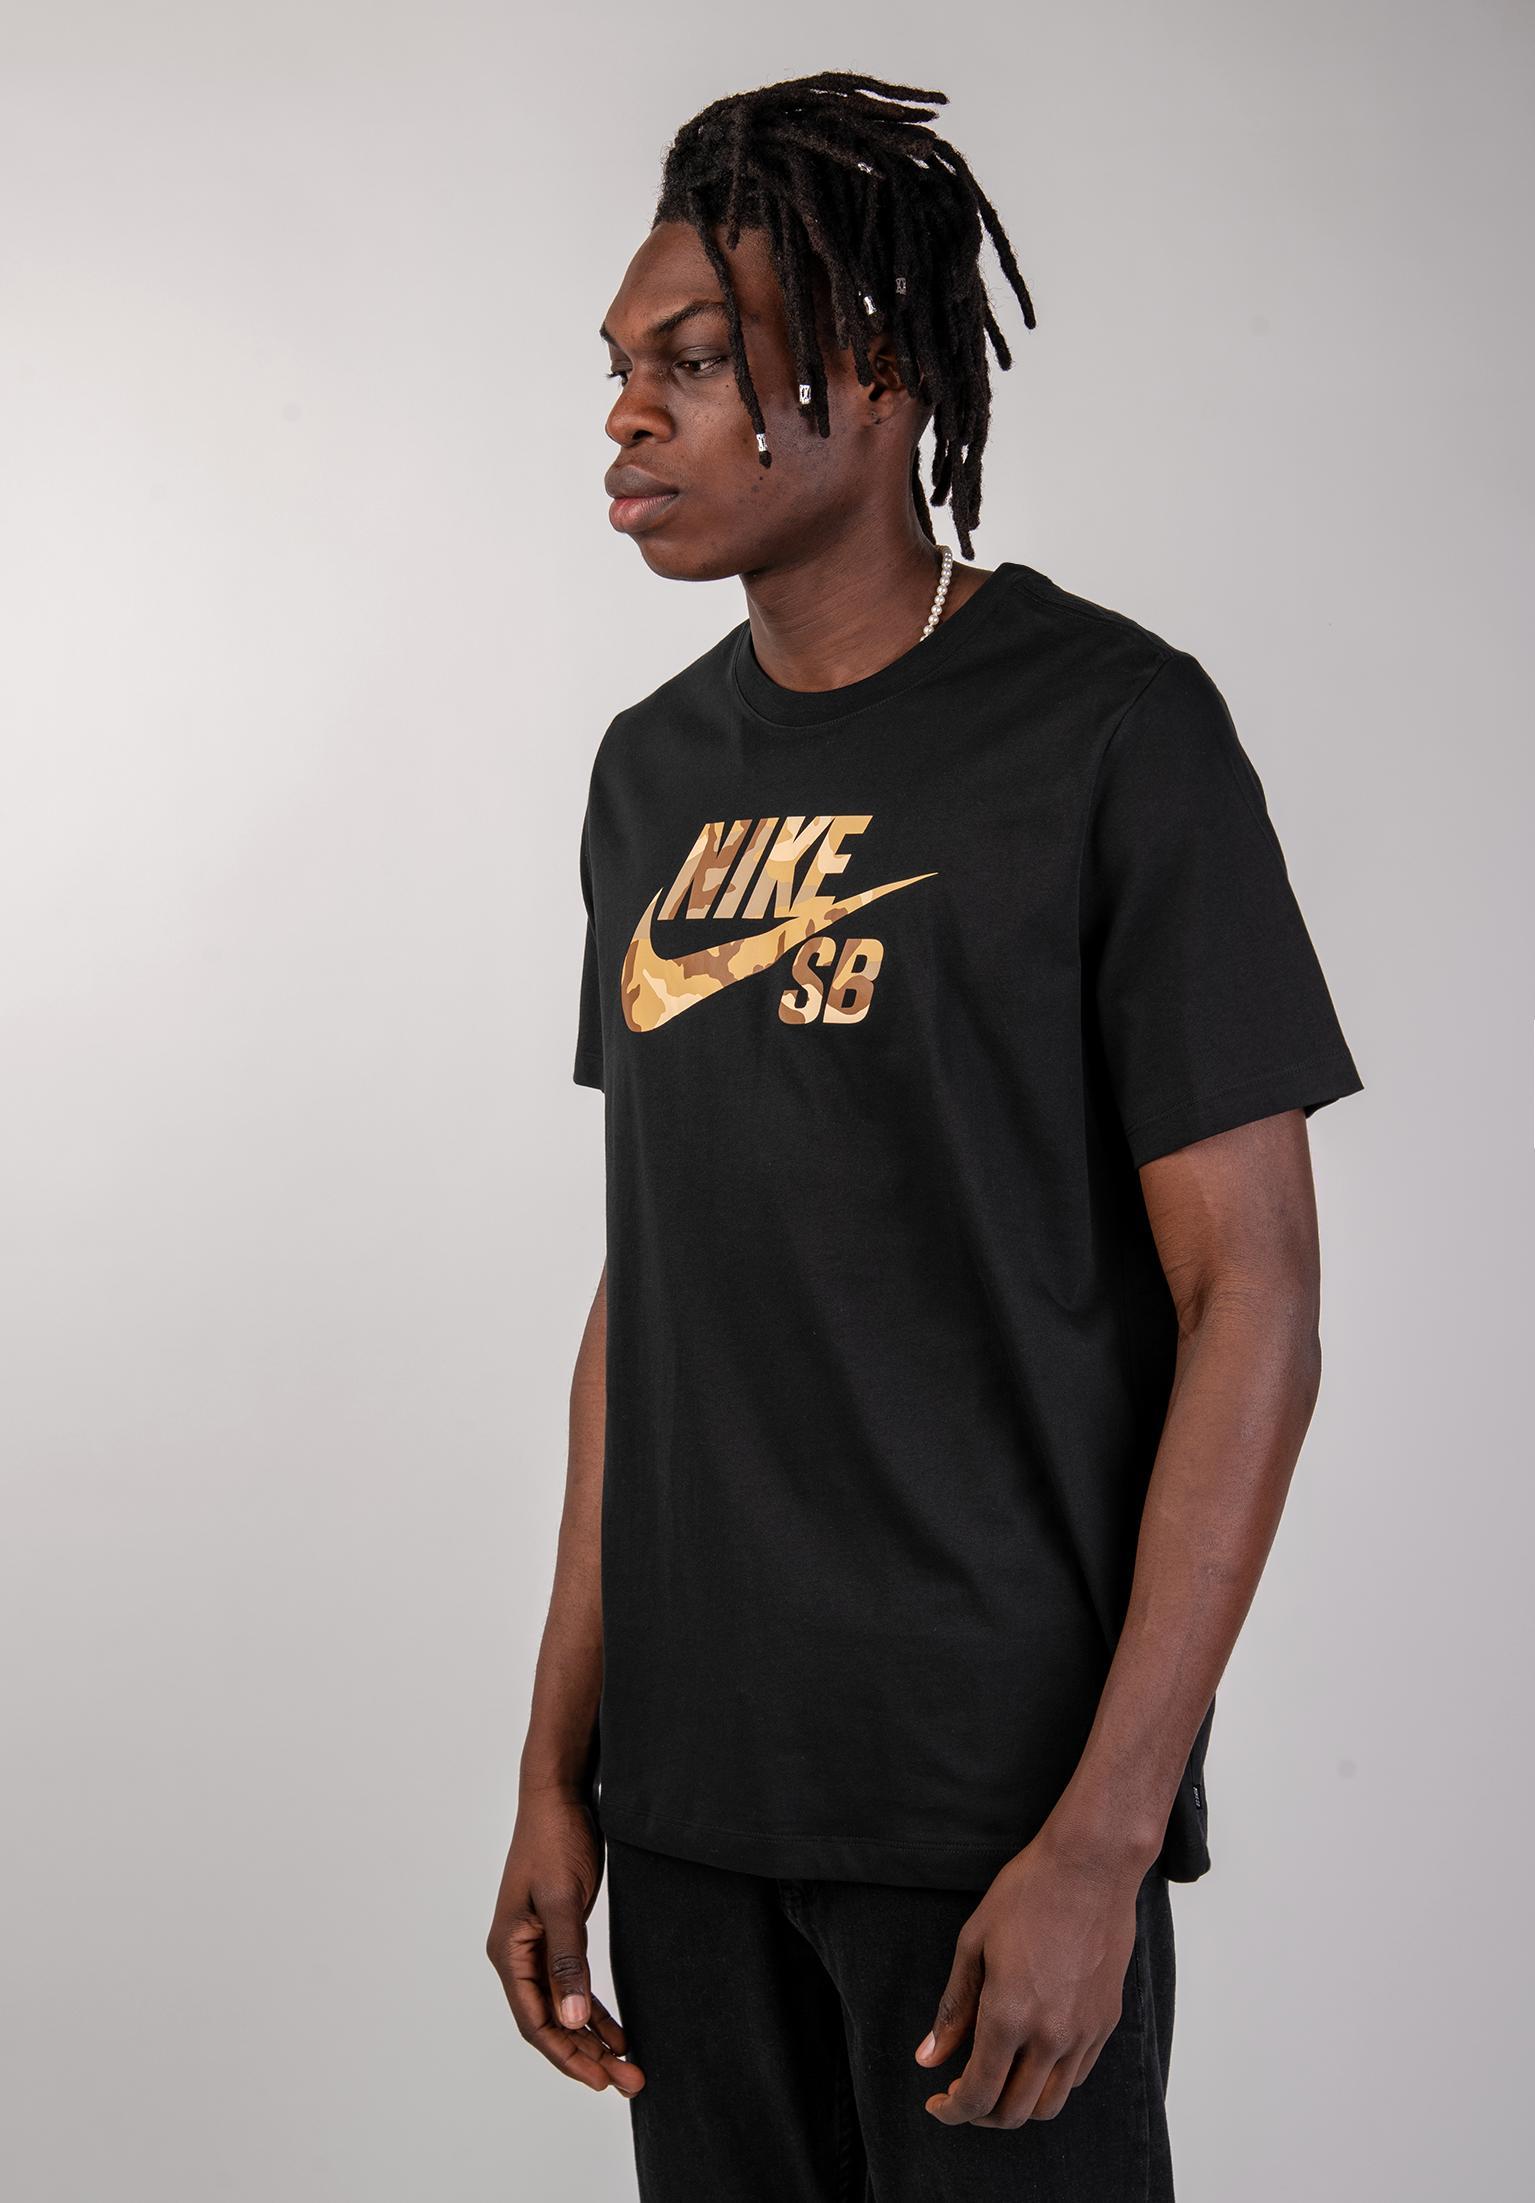 DFT Icon Logo Snsl 2 Nike SB T shirt in white desertcamo da